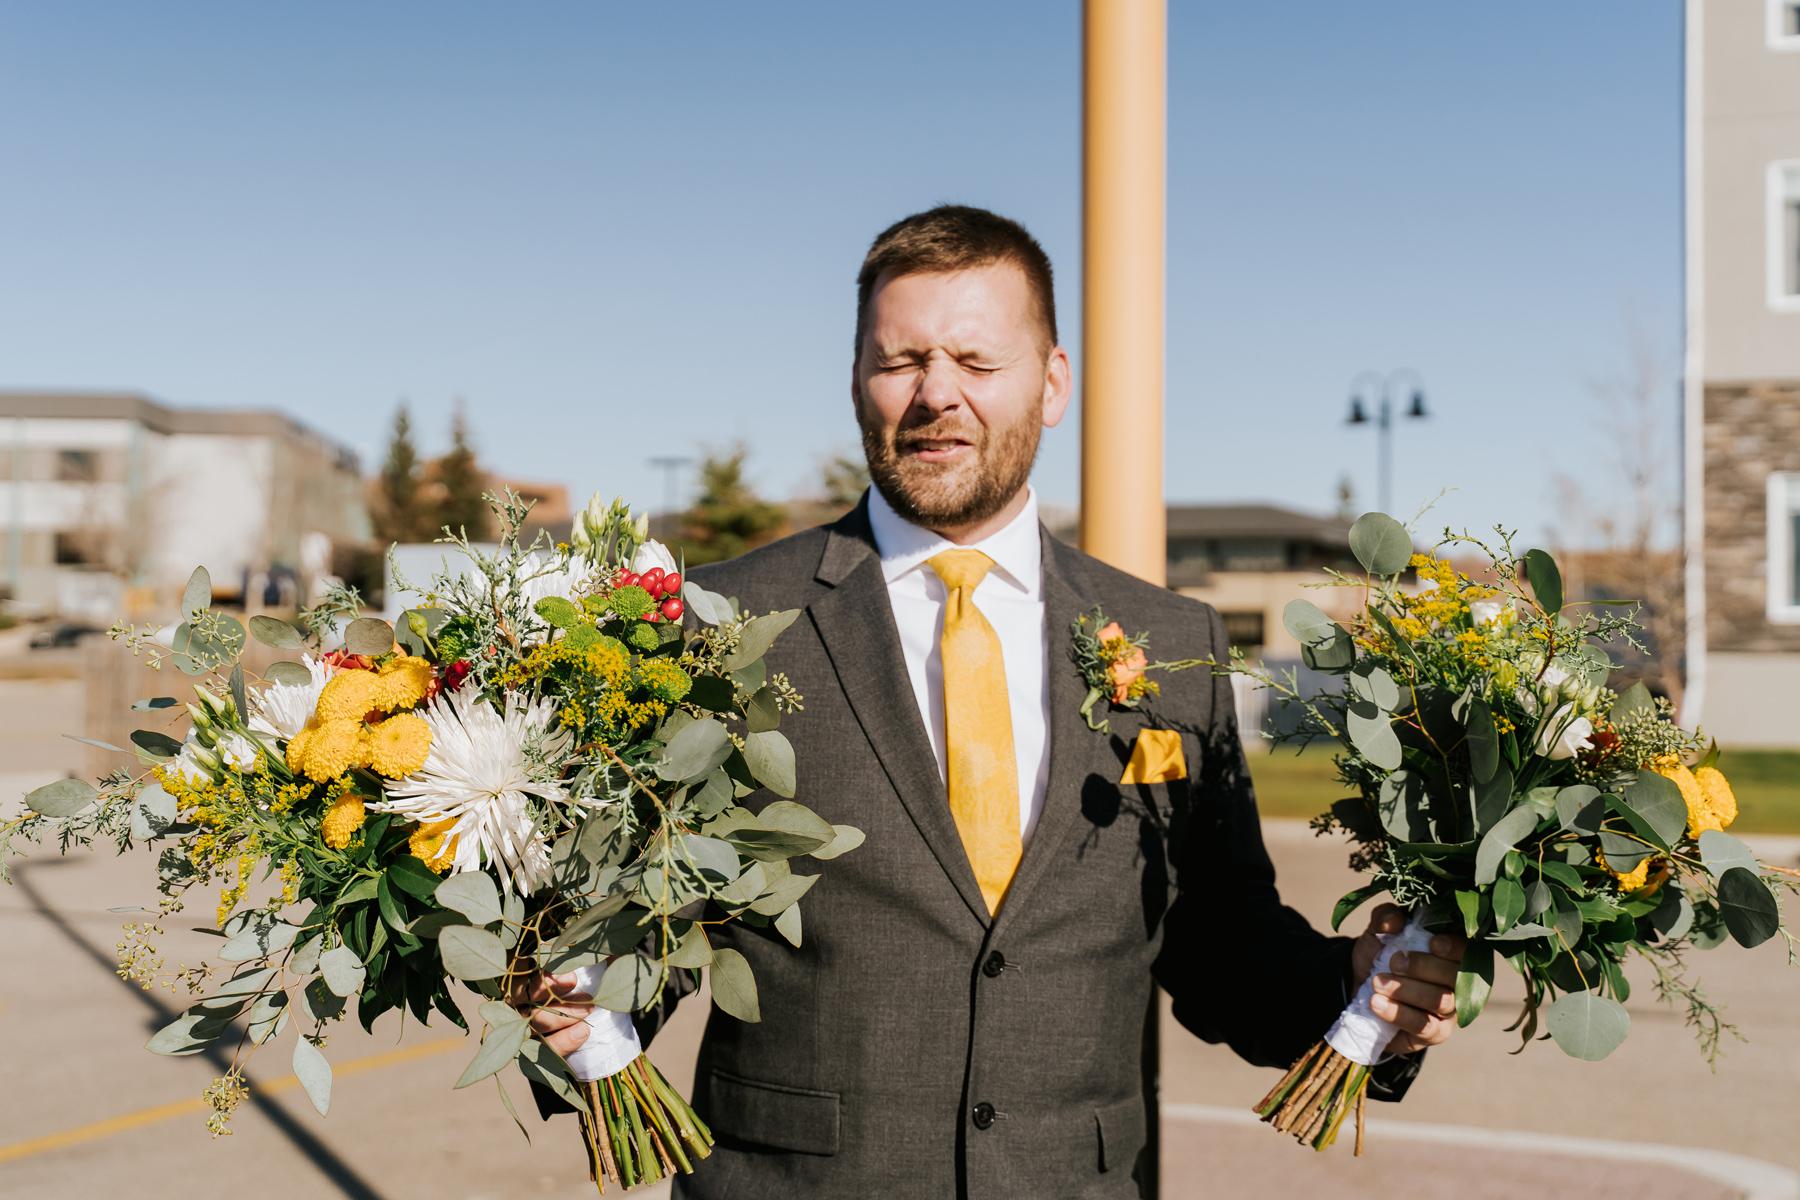 lethbridge-wedding-photography-pd2019-49